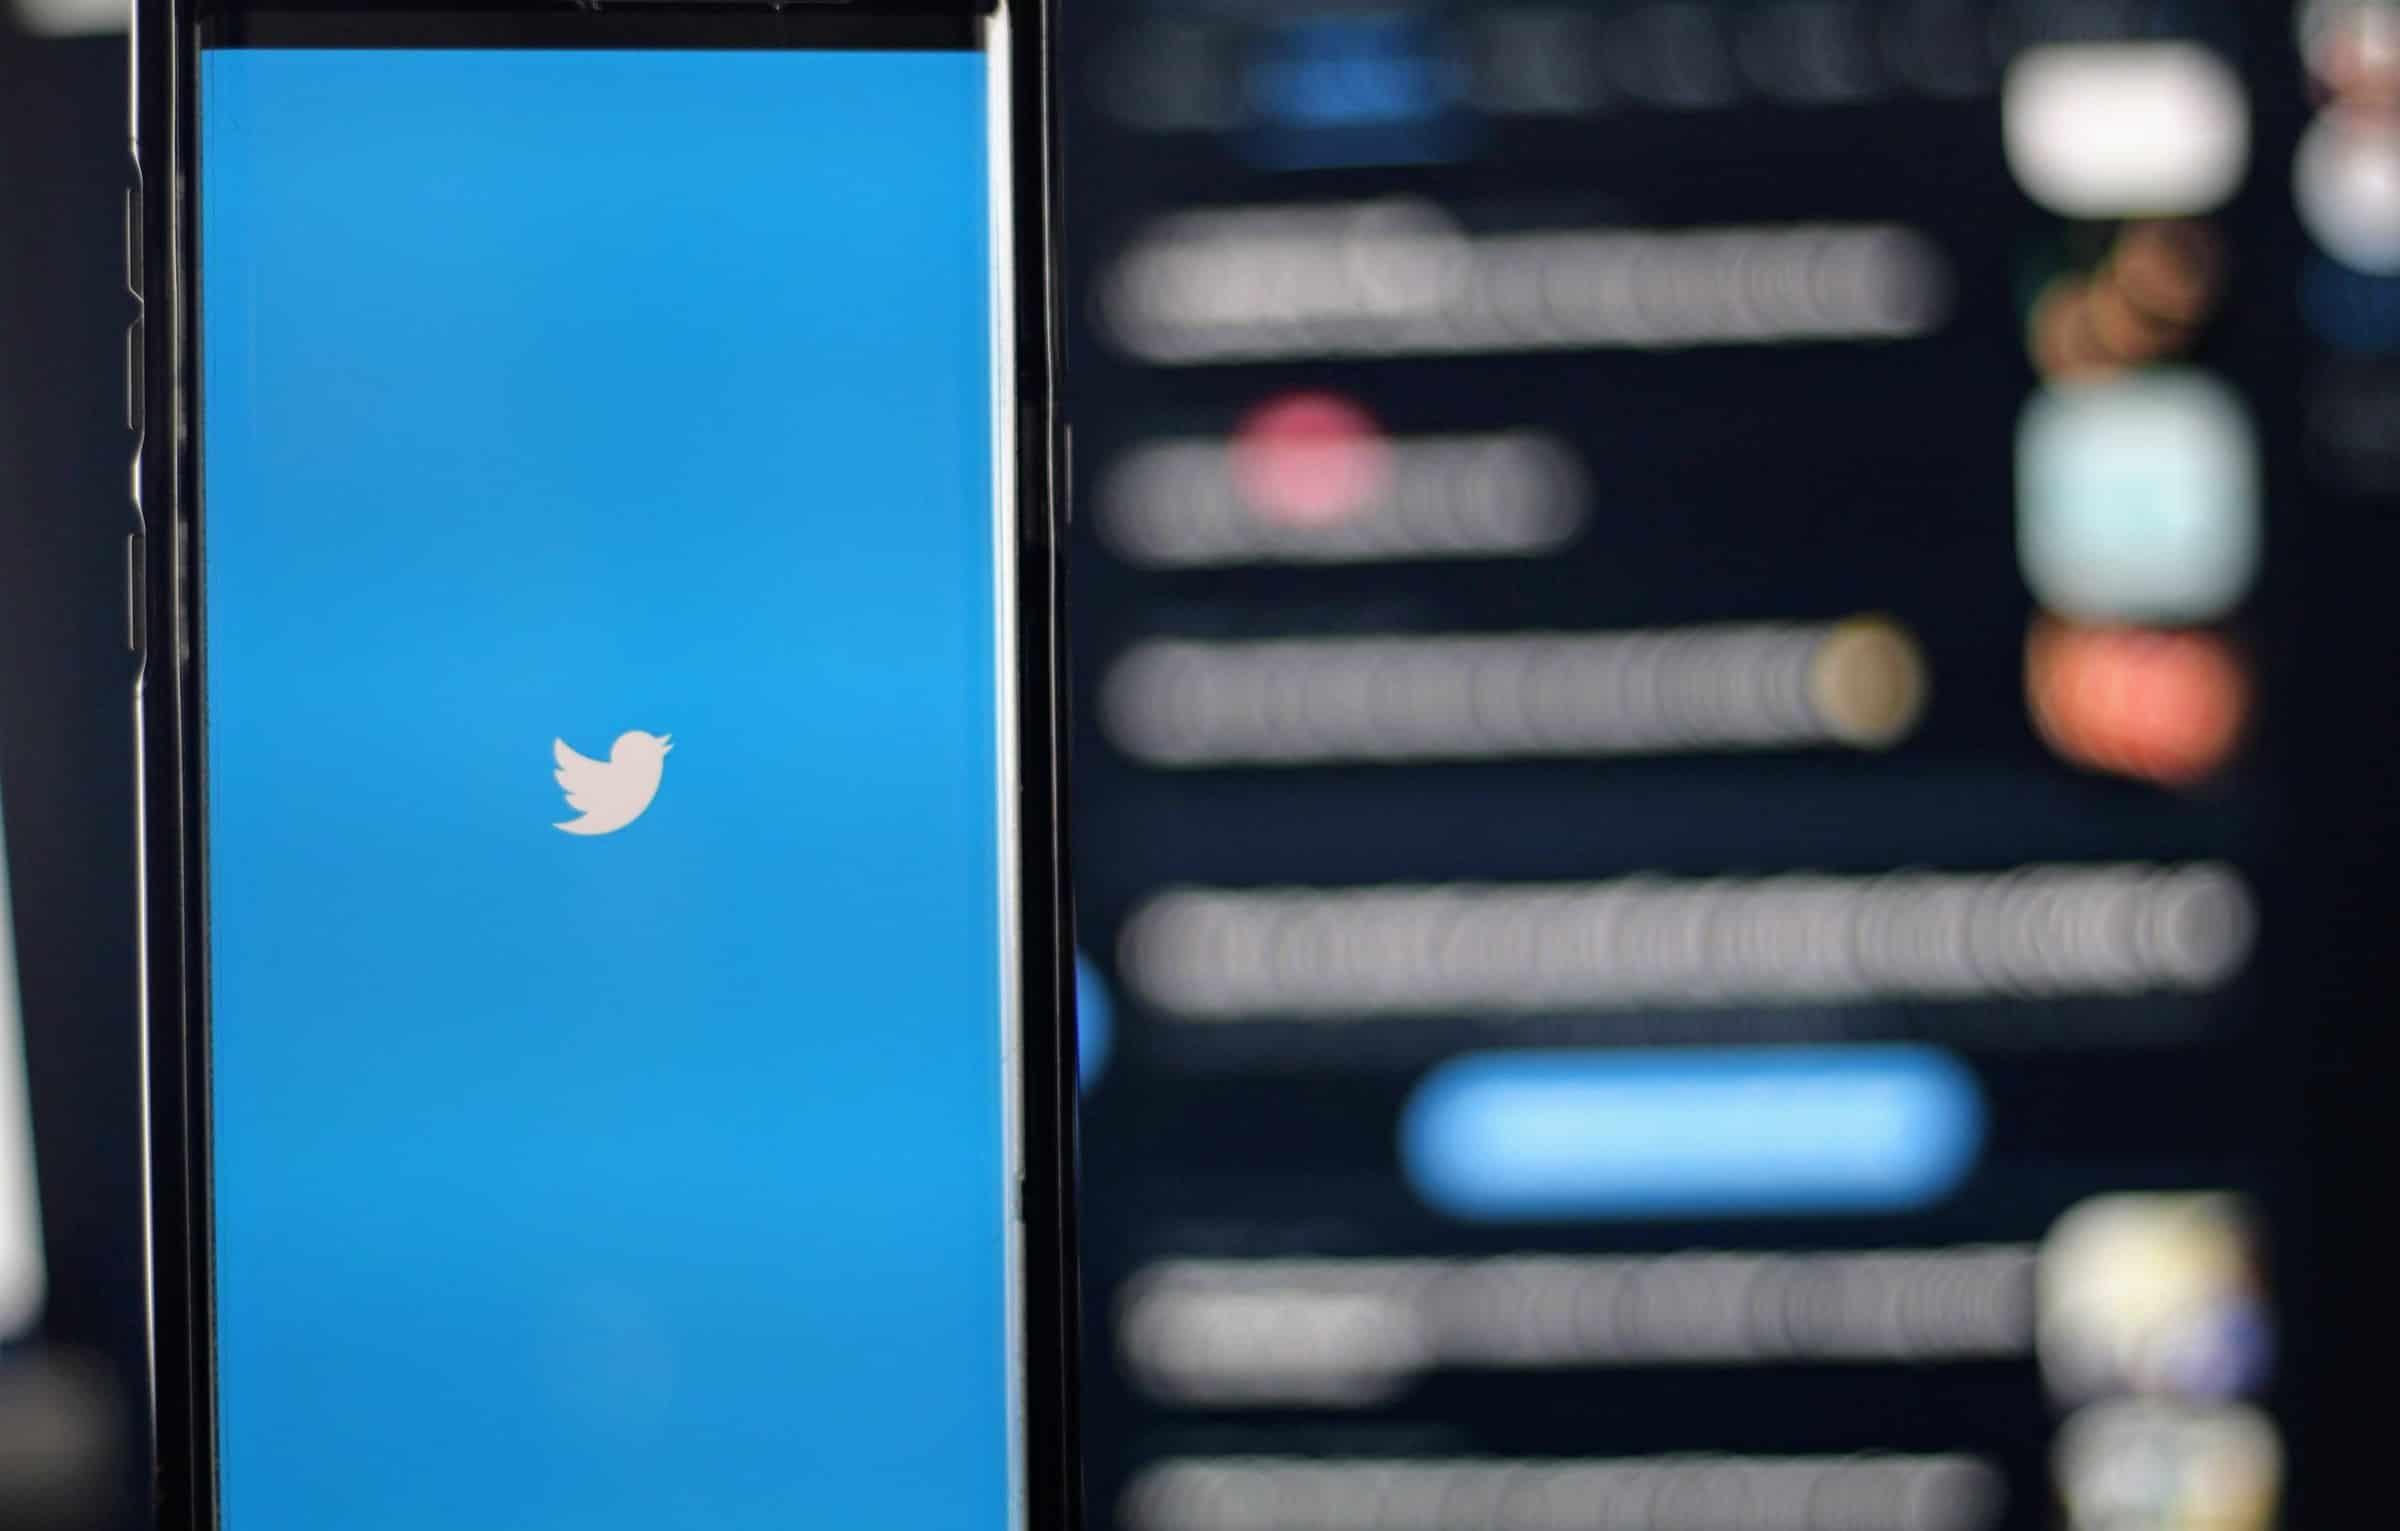 Phone showing Twitter logo